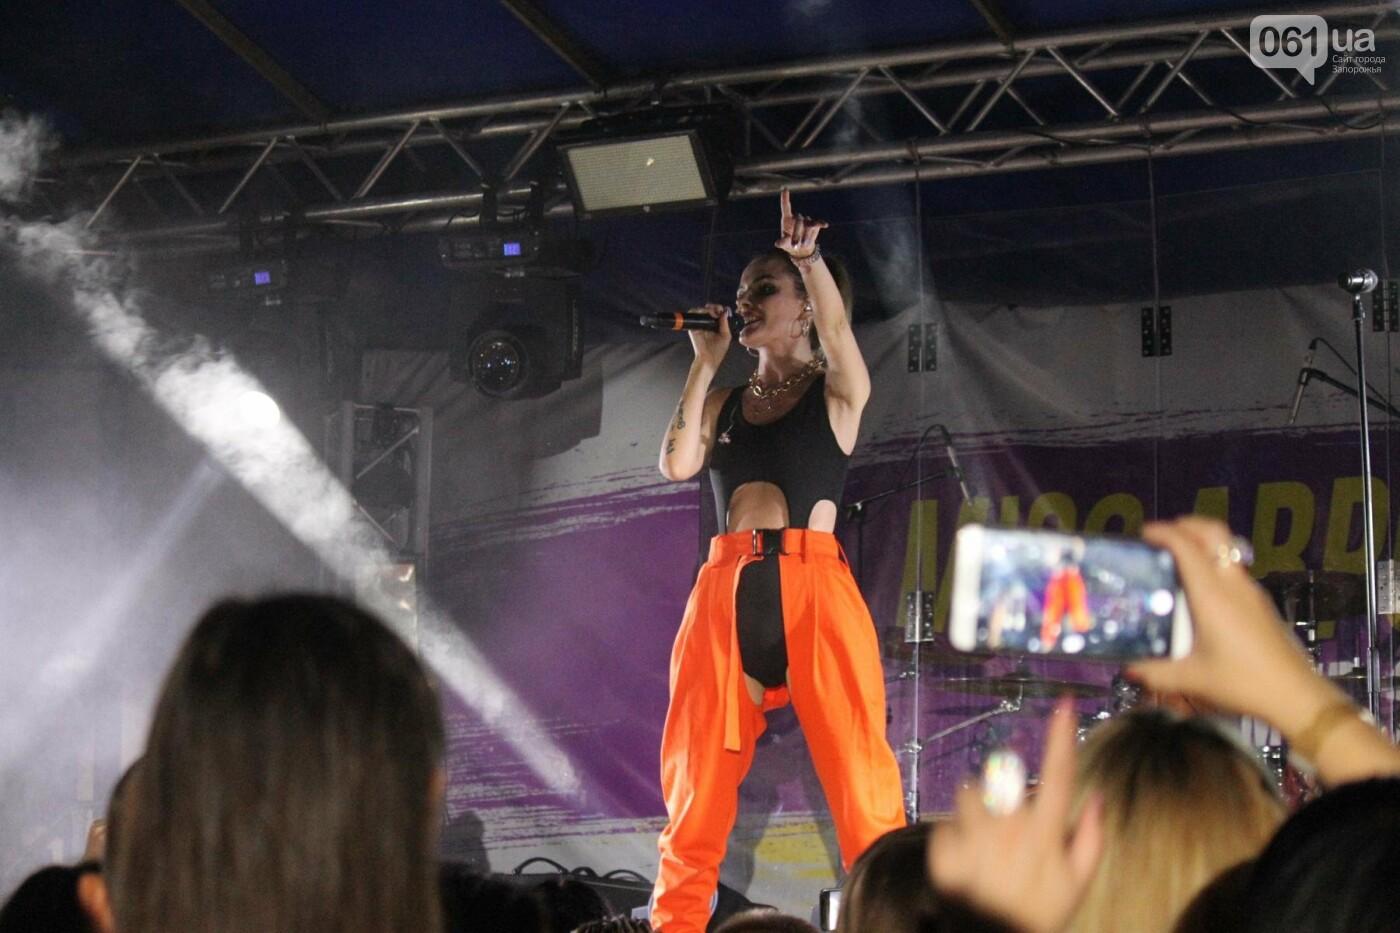 ALEKSEEV, «Агонь» и MamaRika: в Запорожье звезды устроили яркий концерт на «Miss AVRORA Summer 2018», – ФОТОРЕПОРТАЖ, фото-7